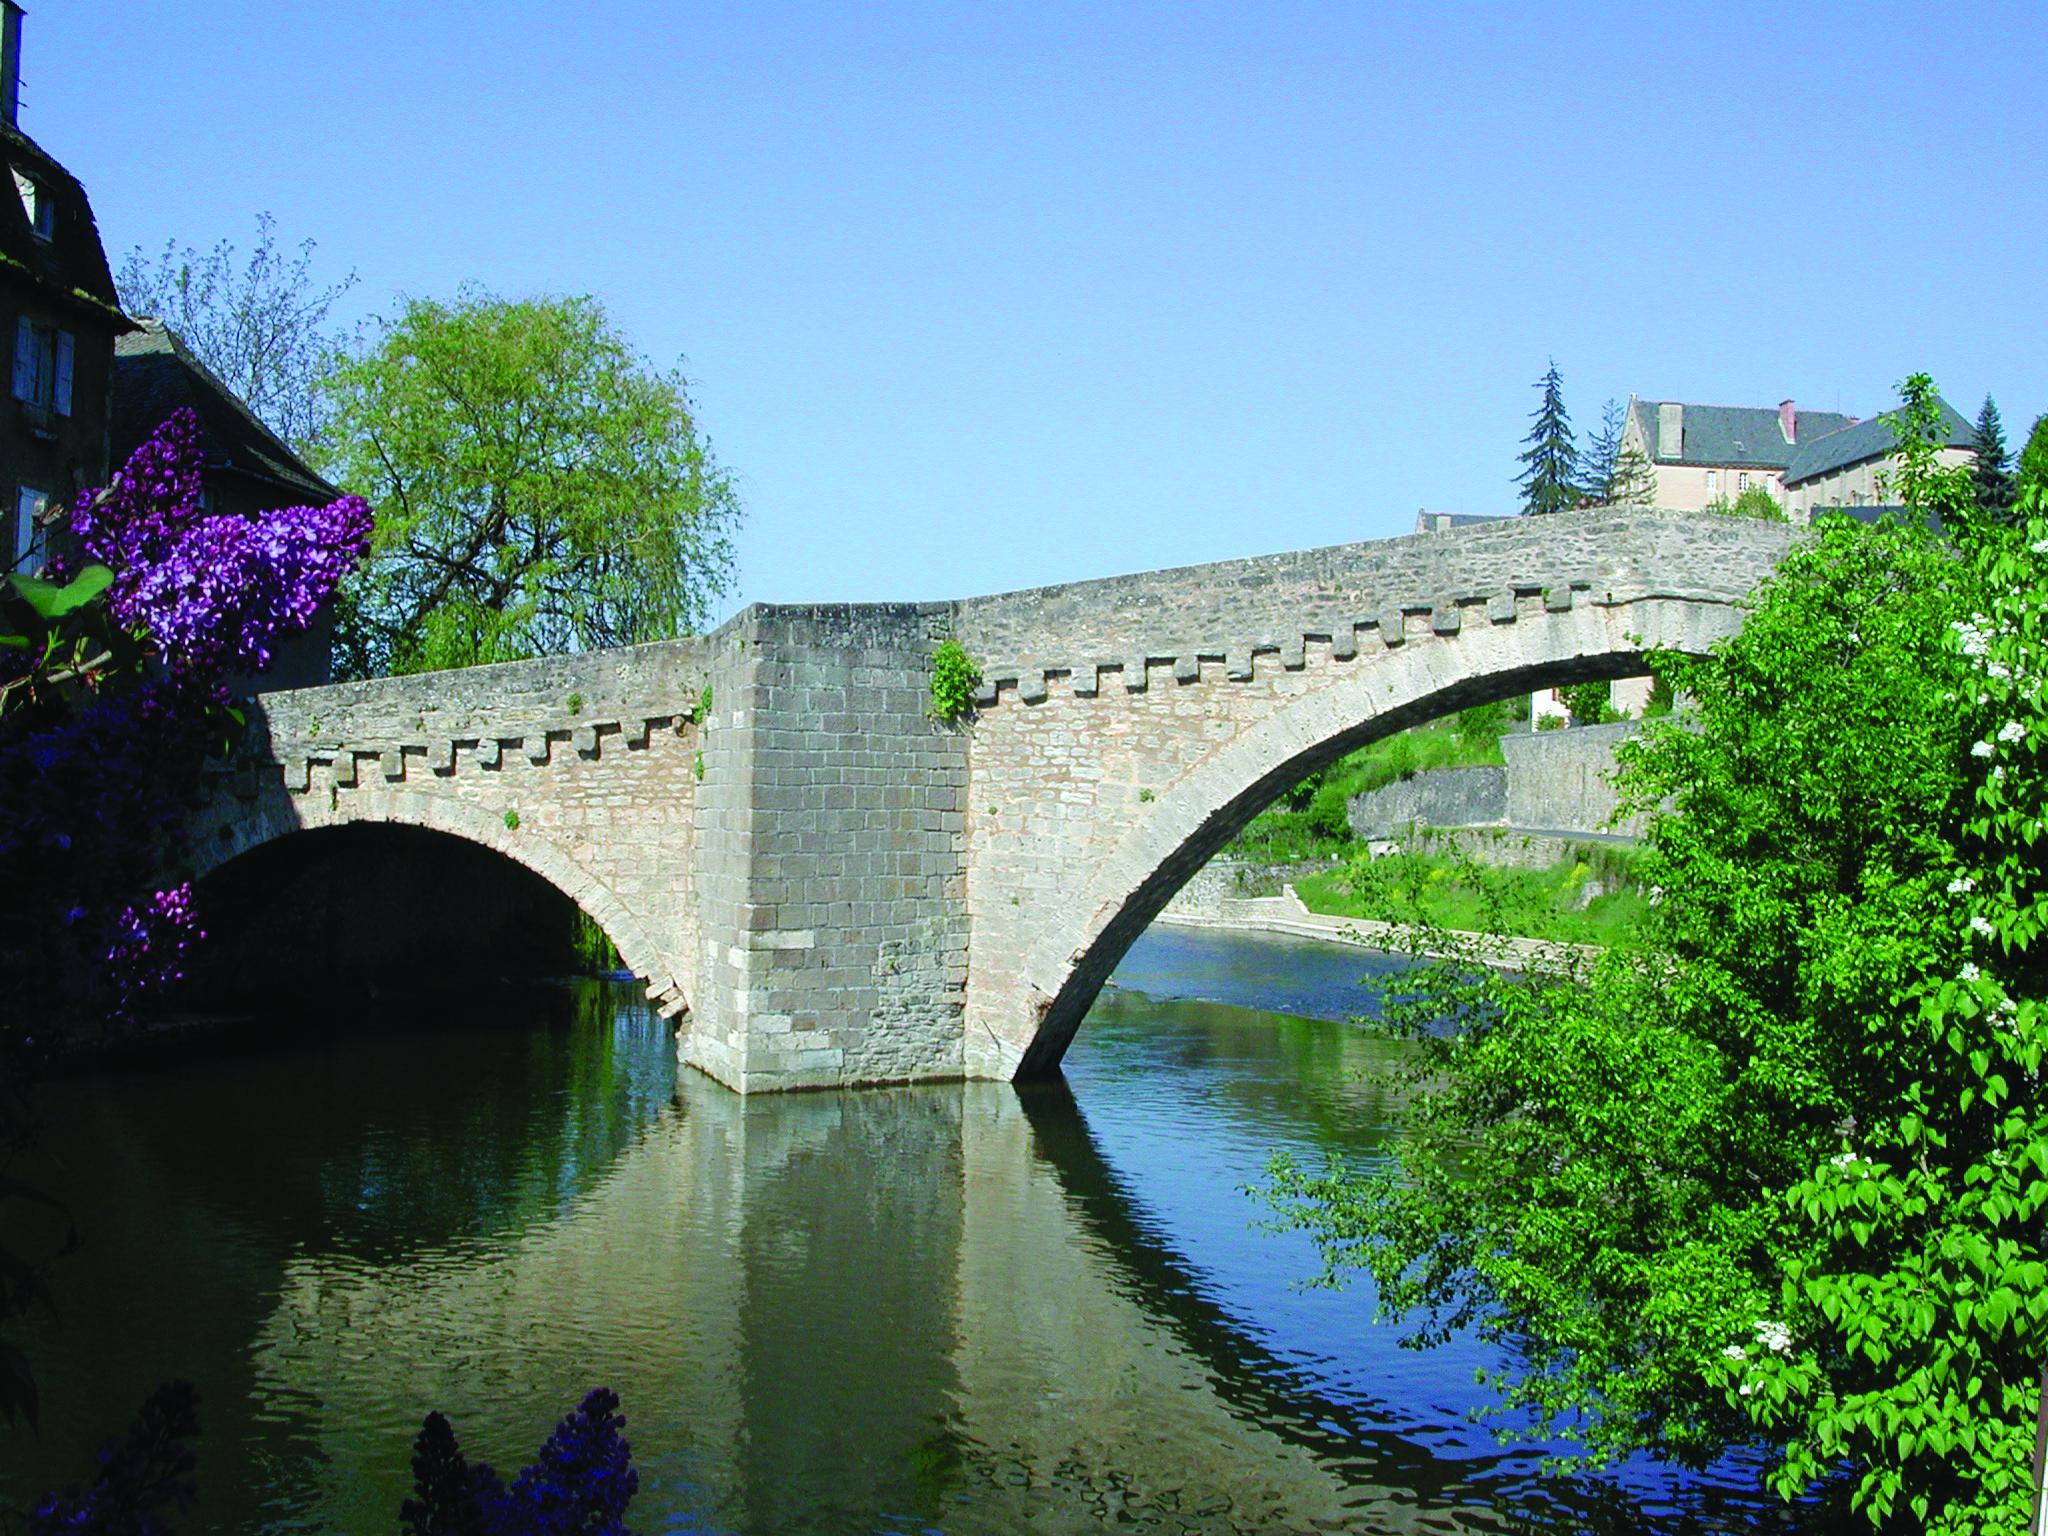 The 12th century Notre-Dame bridge in Mende